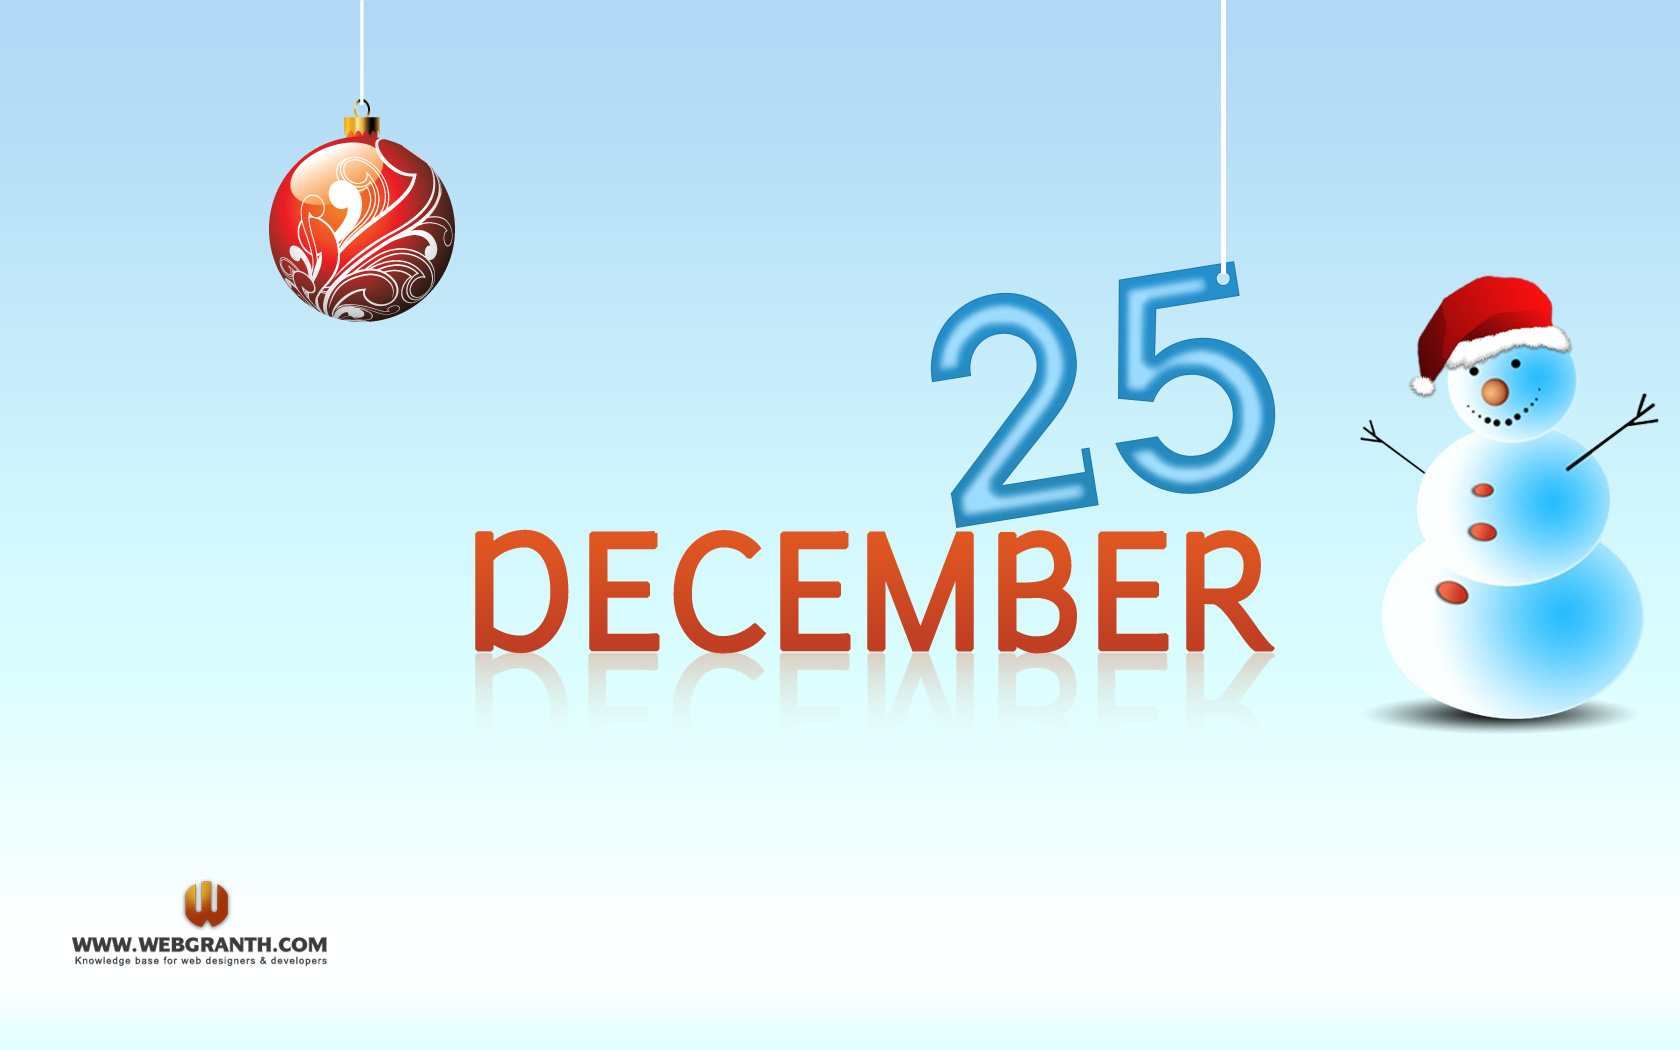 HD Christmas Wallpapers Download Latest Christmas Wallpaper 1680x1050